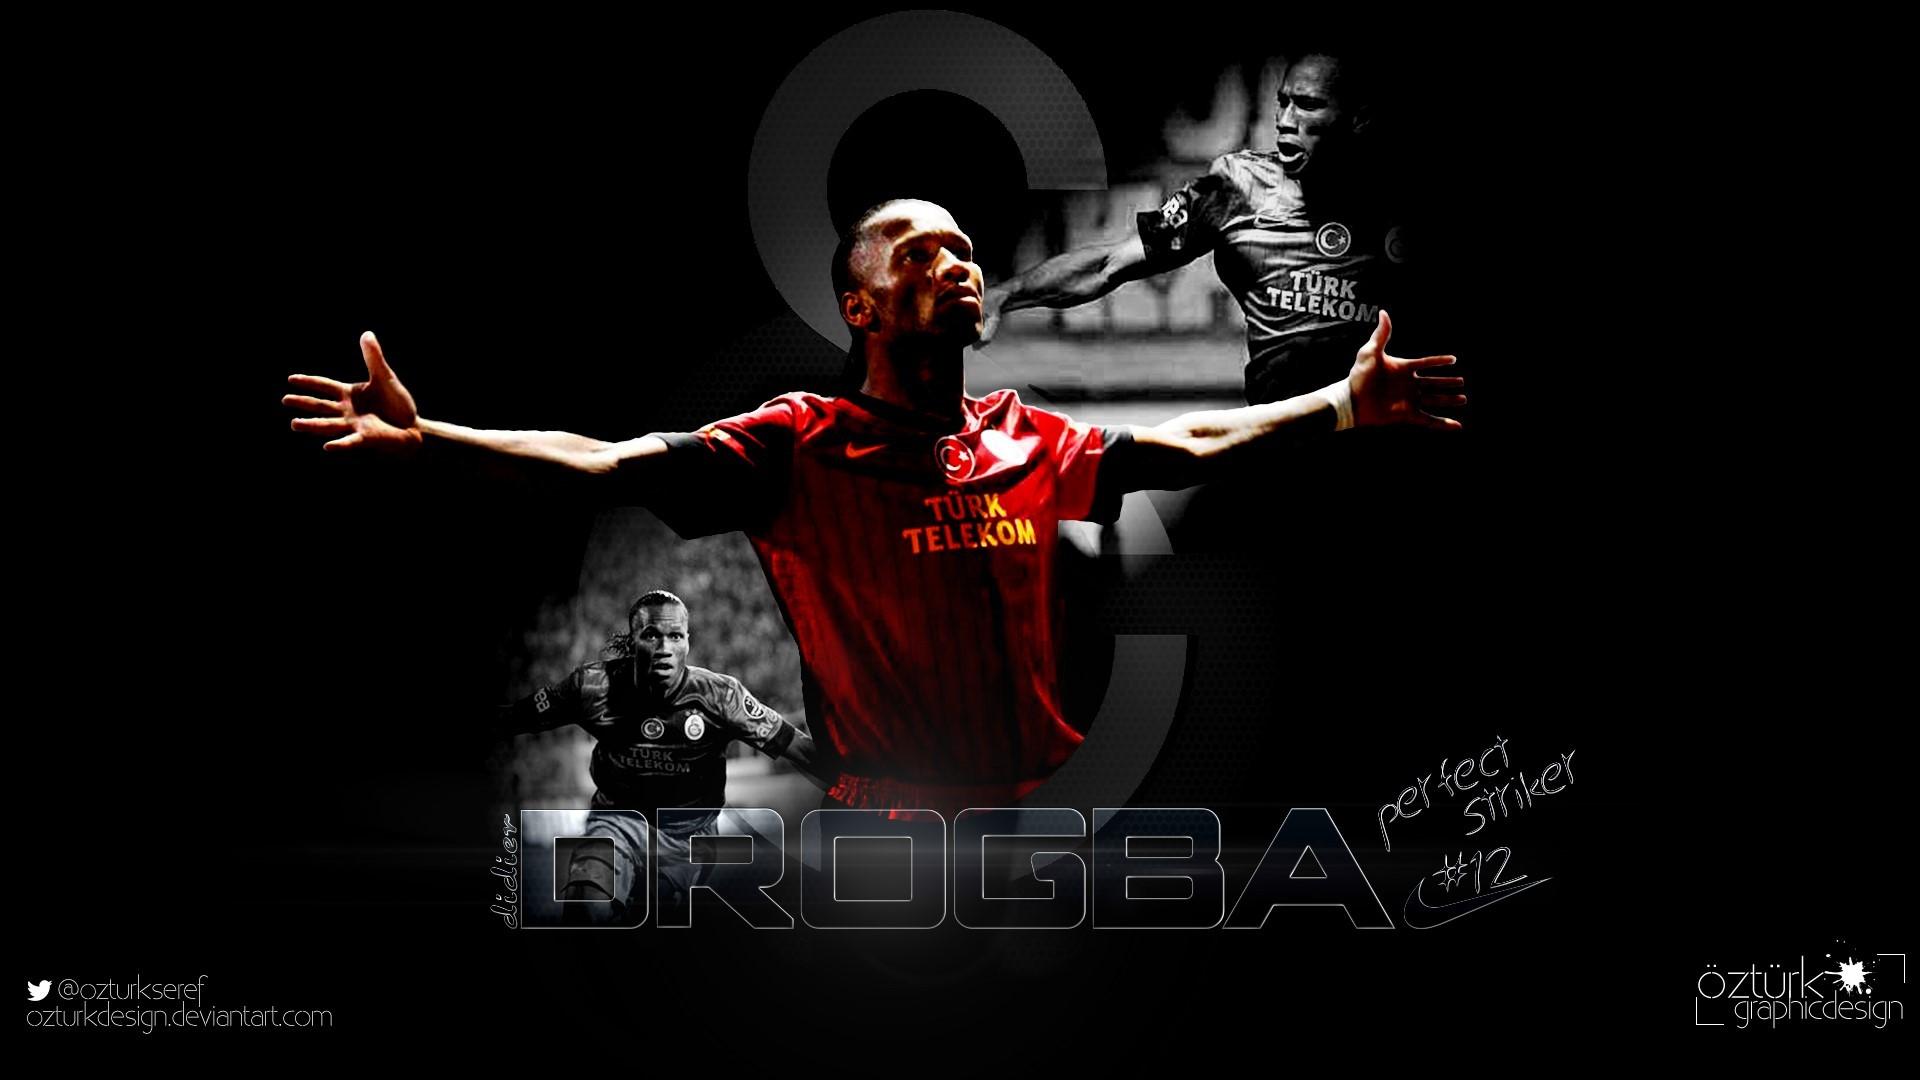 Drogba Galatasaray Wallpaper